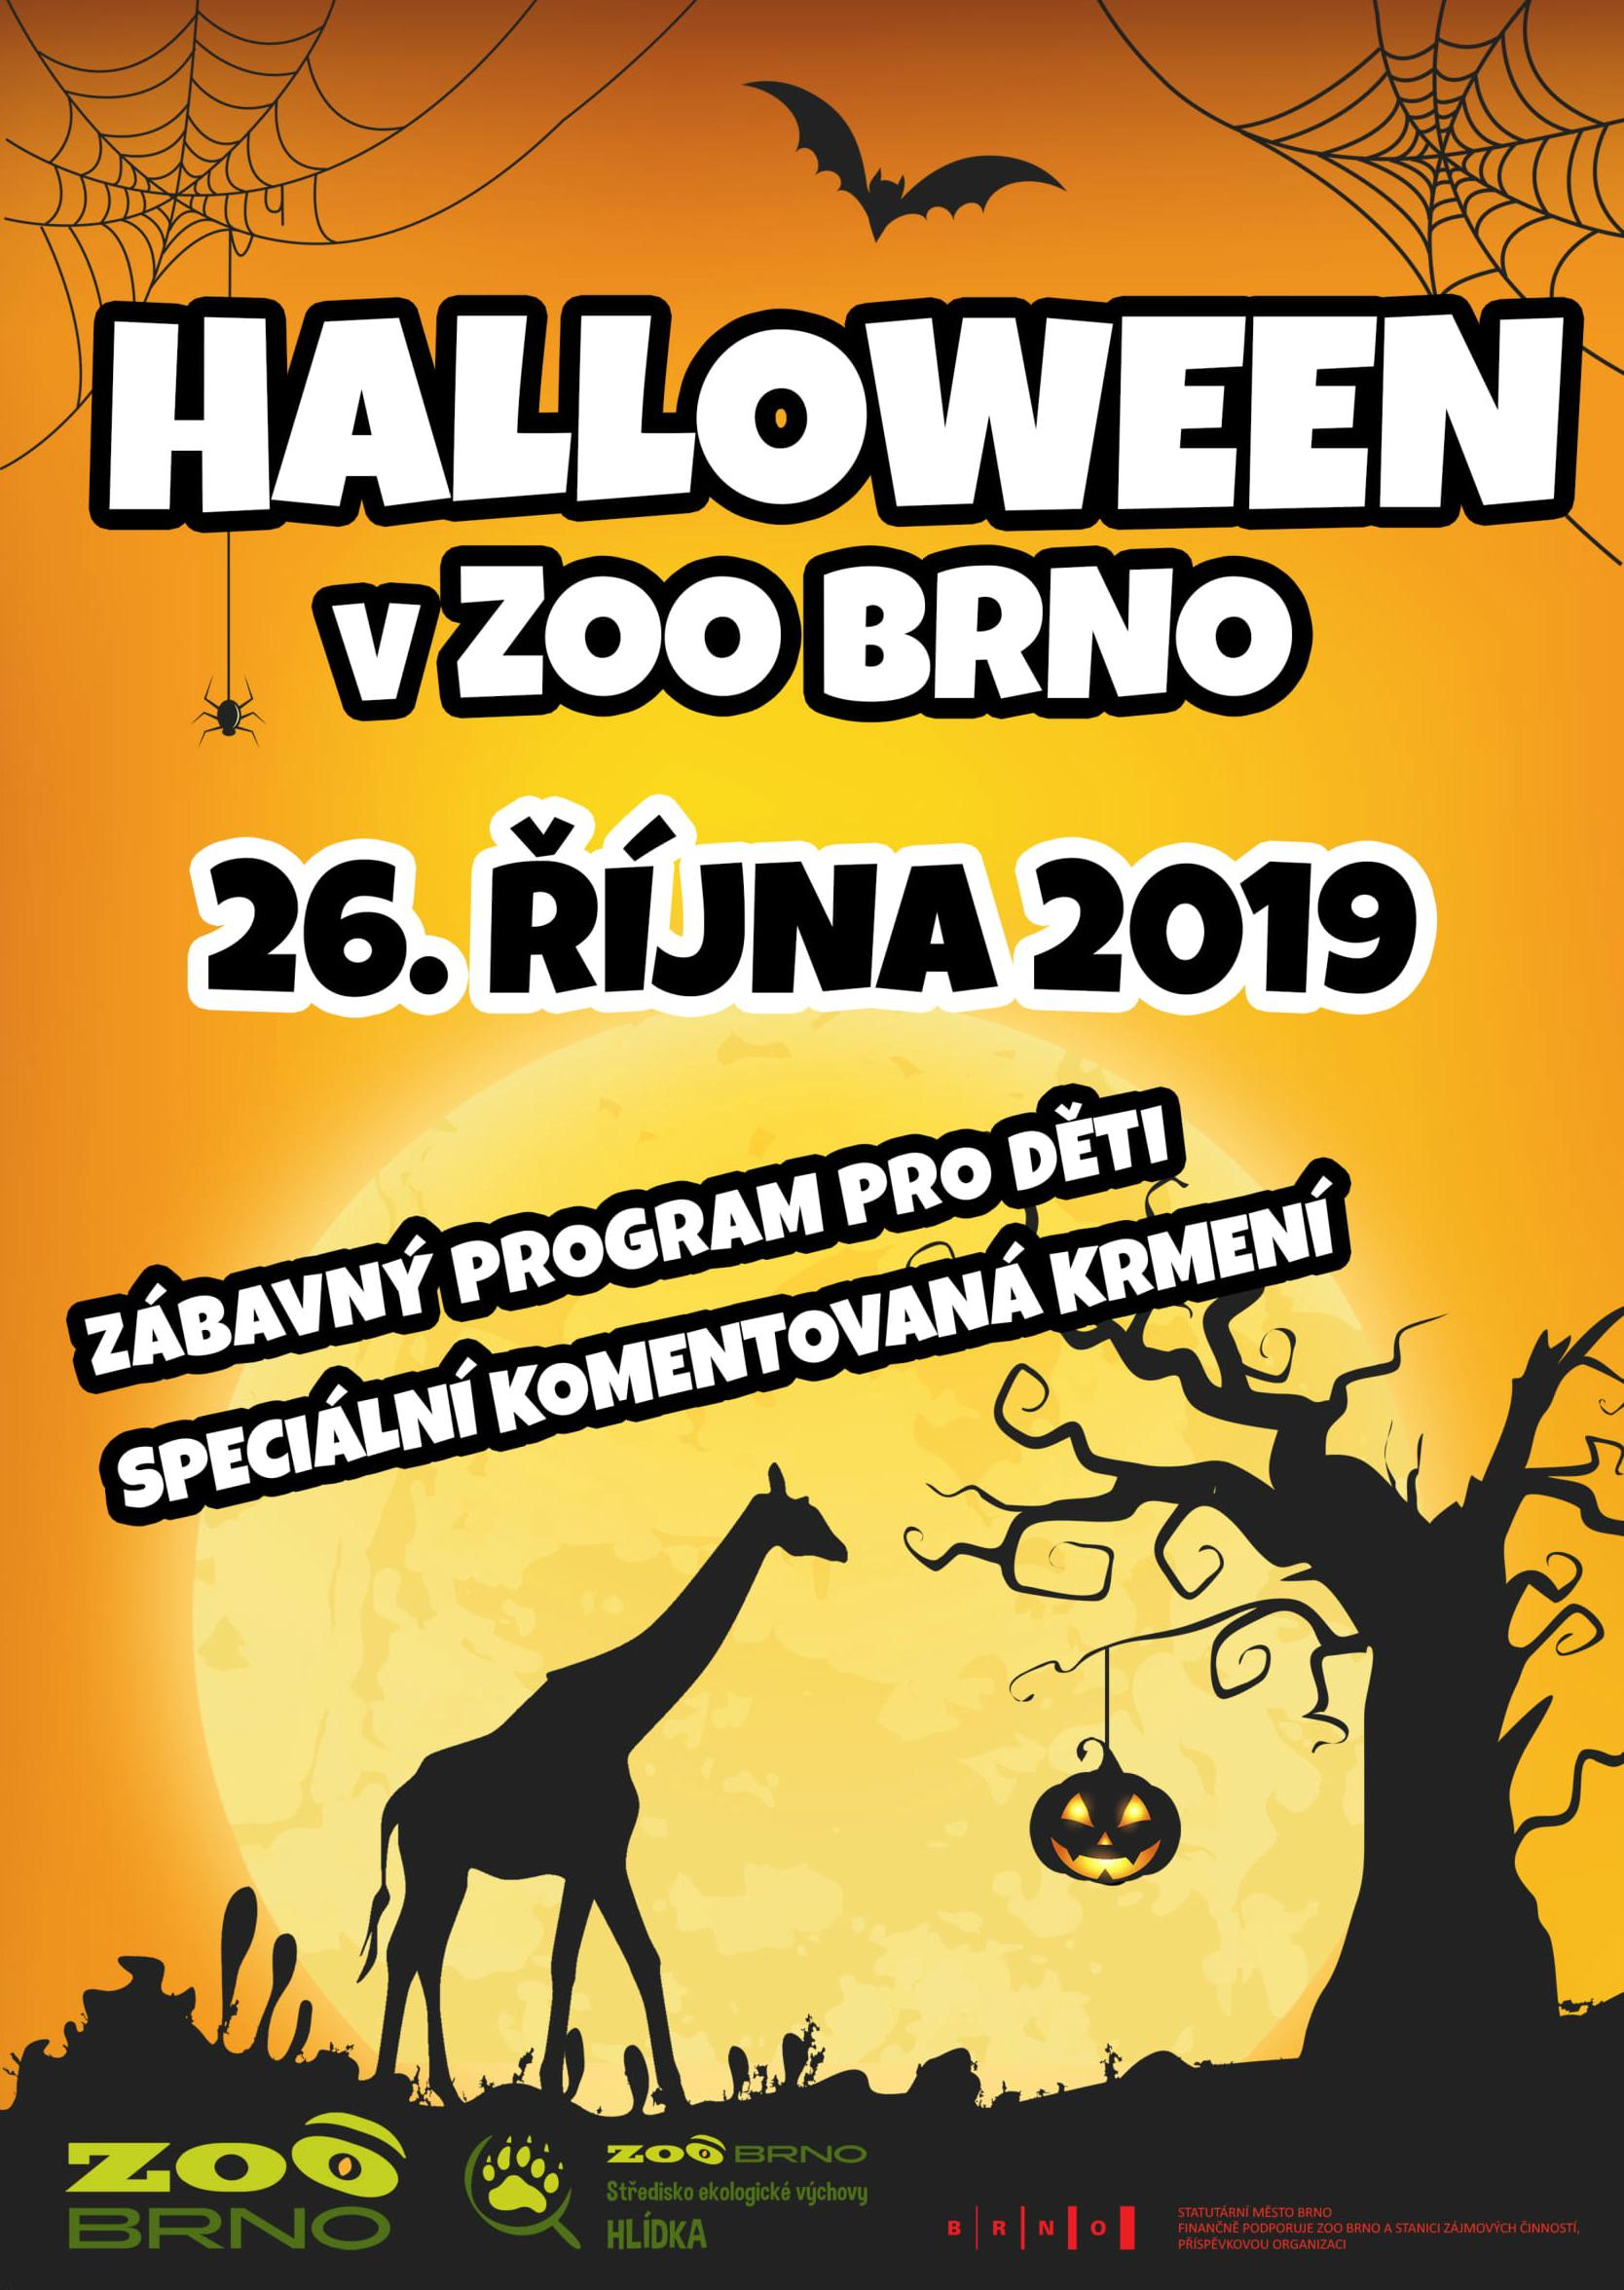 HalloweenvZooBrno2019